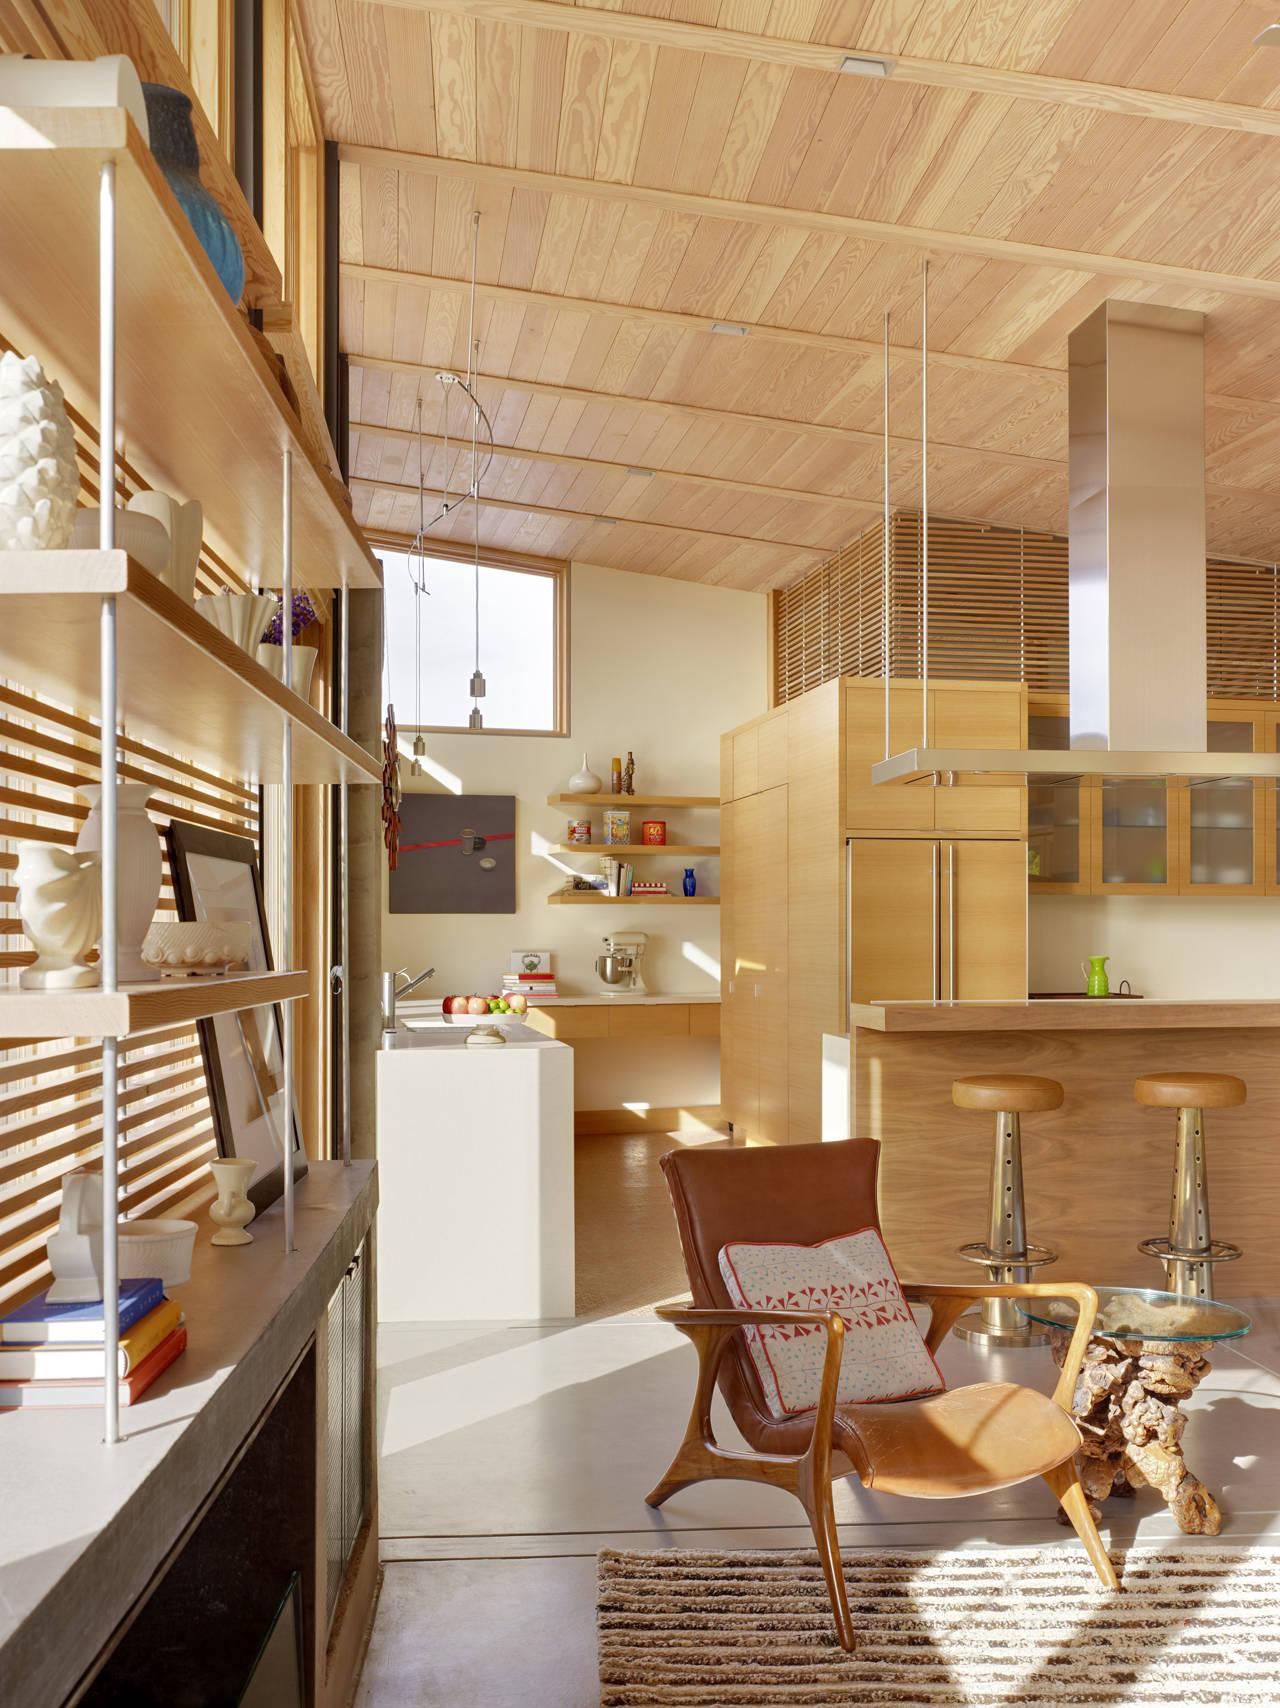 Kitchen, Caterpillar House in Carmel, California by Feldman Architecture